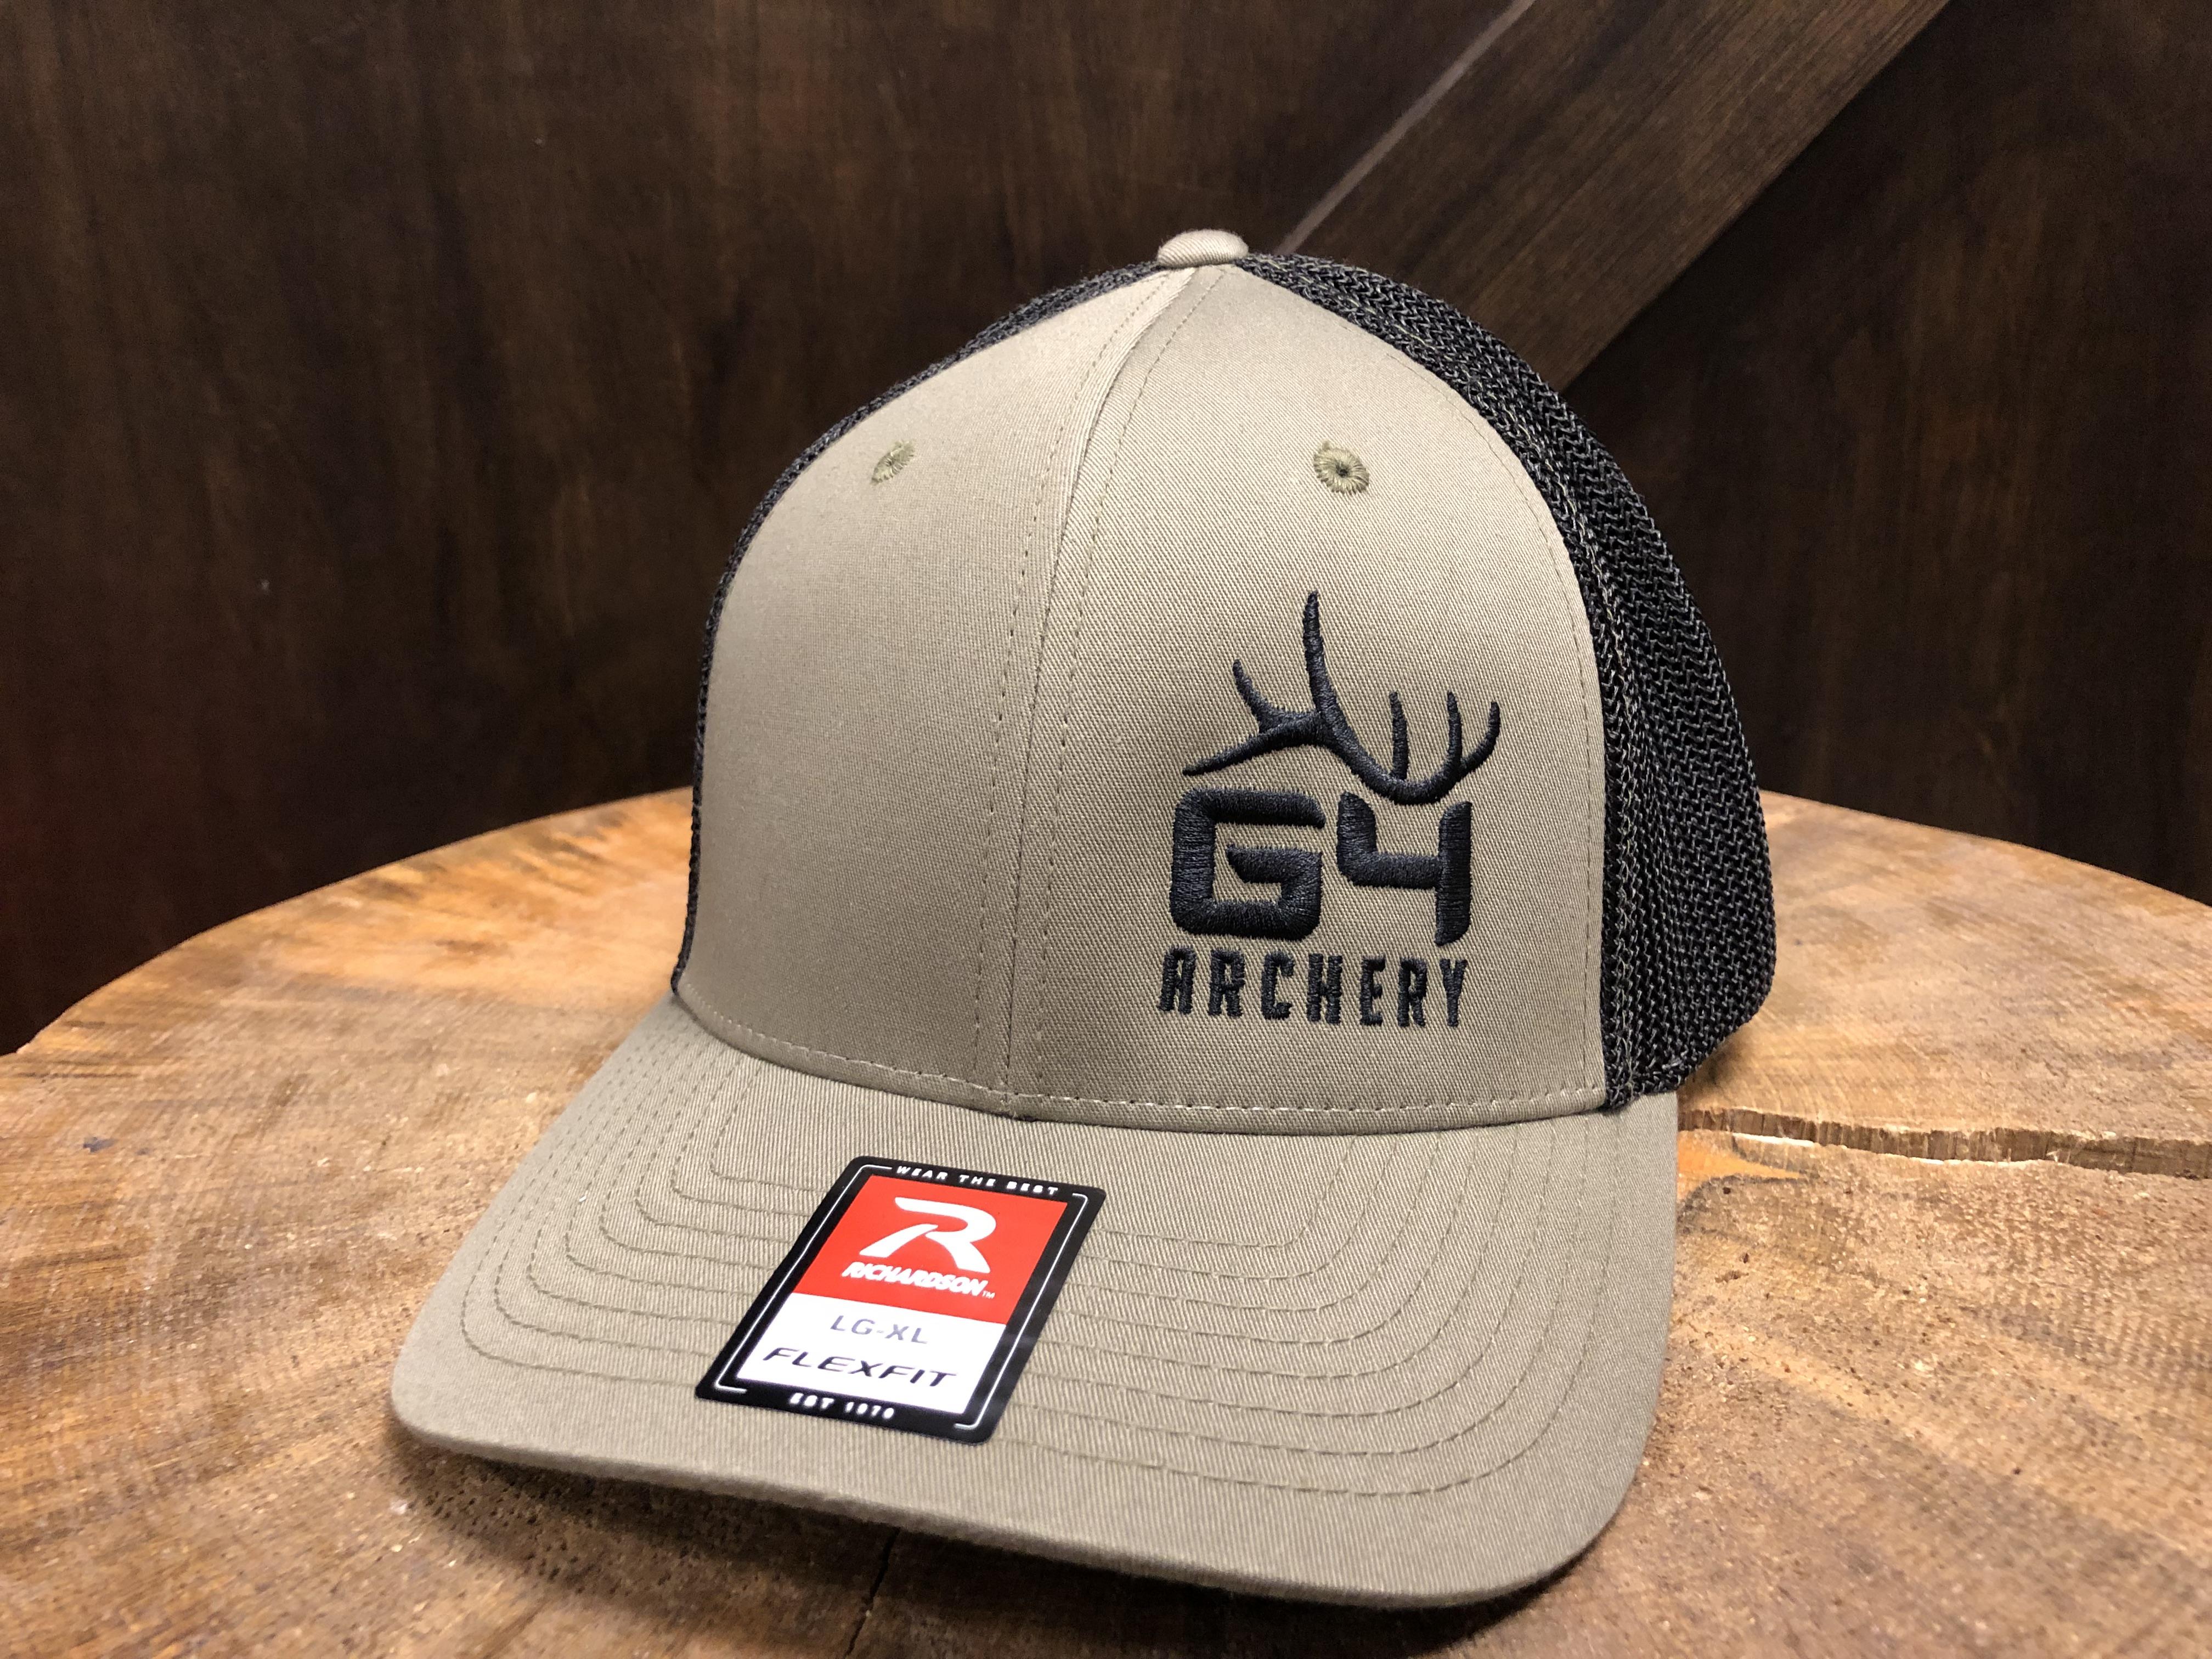 047ee5fb1c9 G4 Archery Trucker Flex Fit Hat